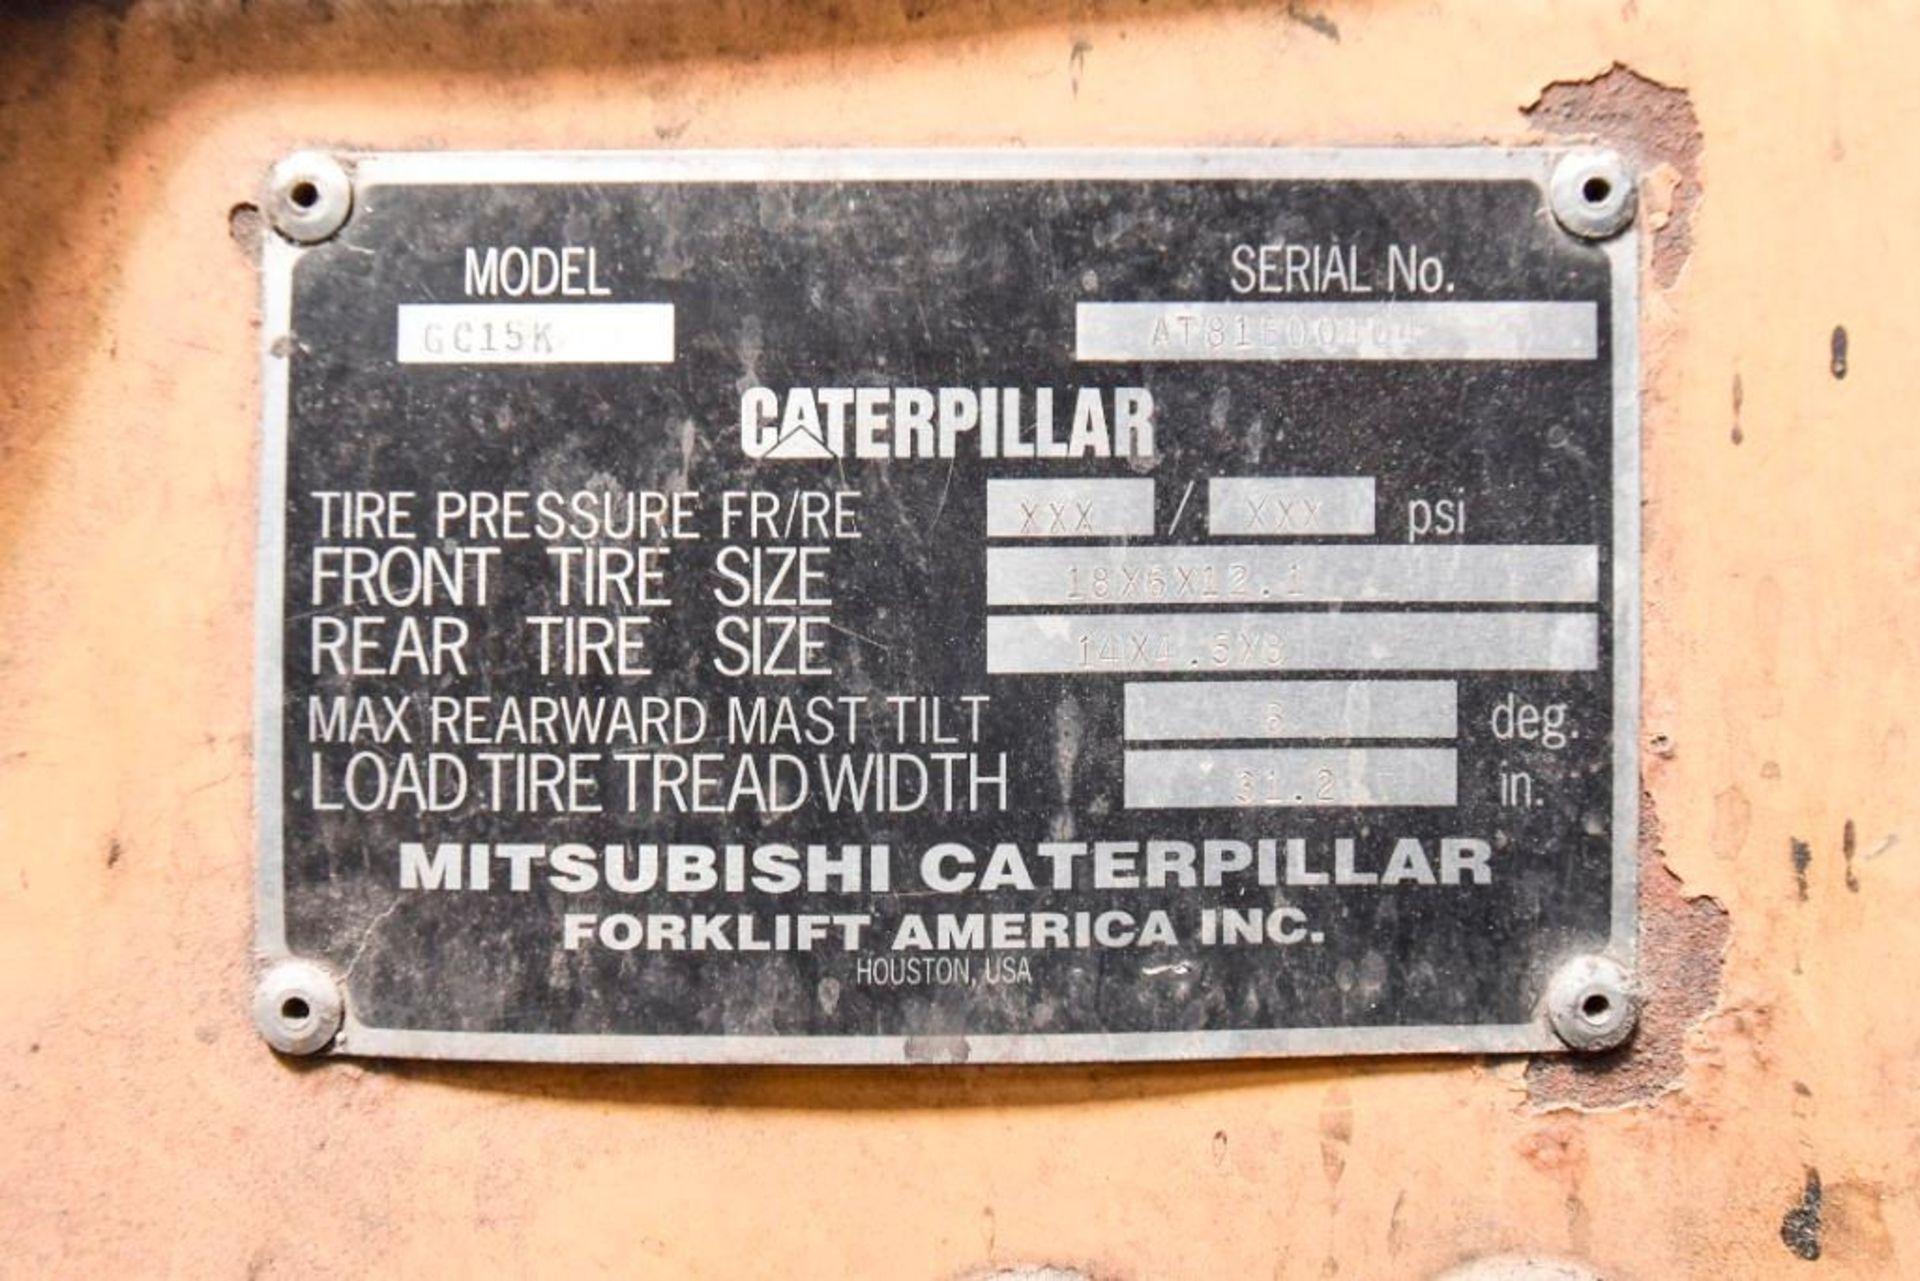 Caterpillar Propane Fork Lift - Image 4 of 4